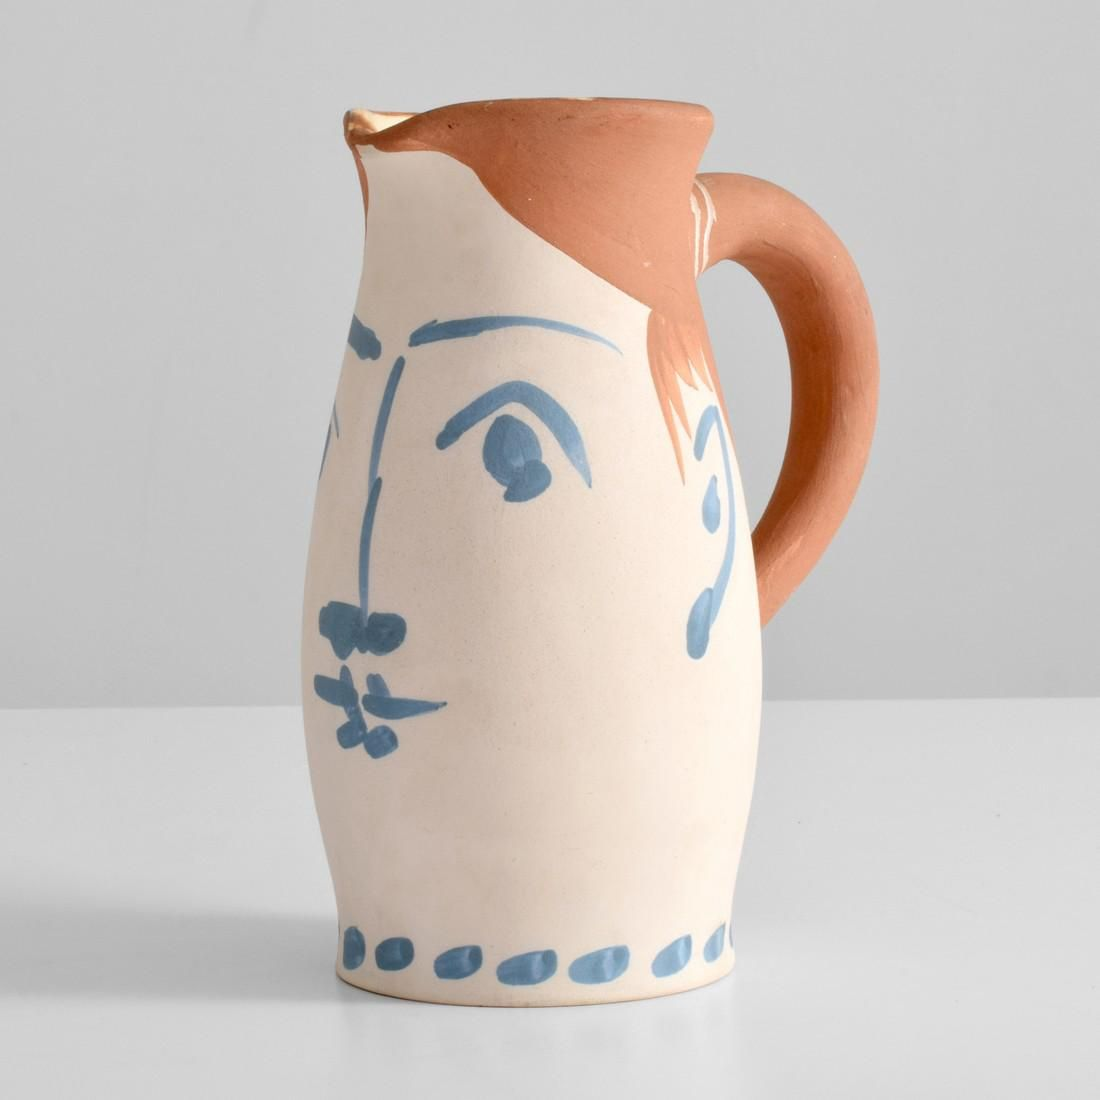 Pablo Picasso VISAGE DE FEMME Handled Vase